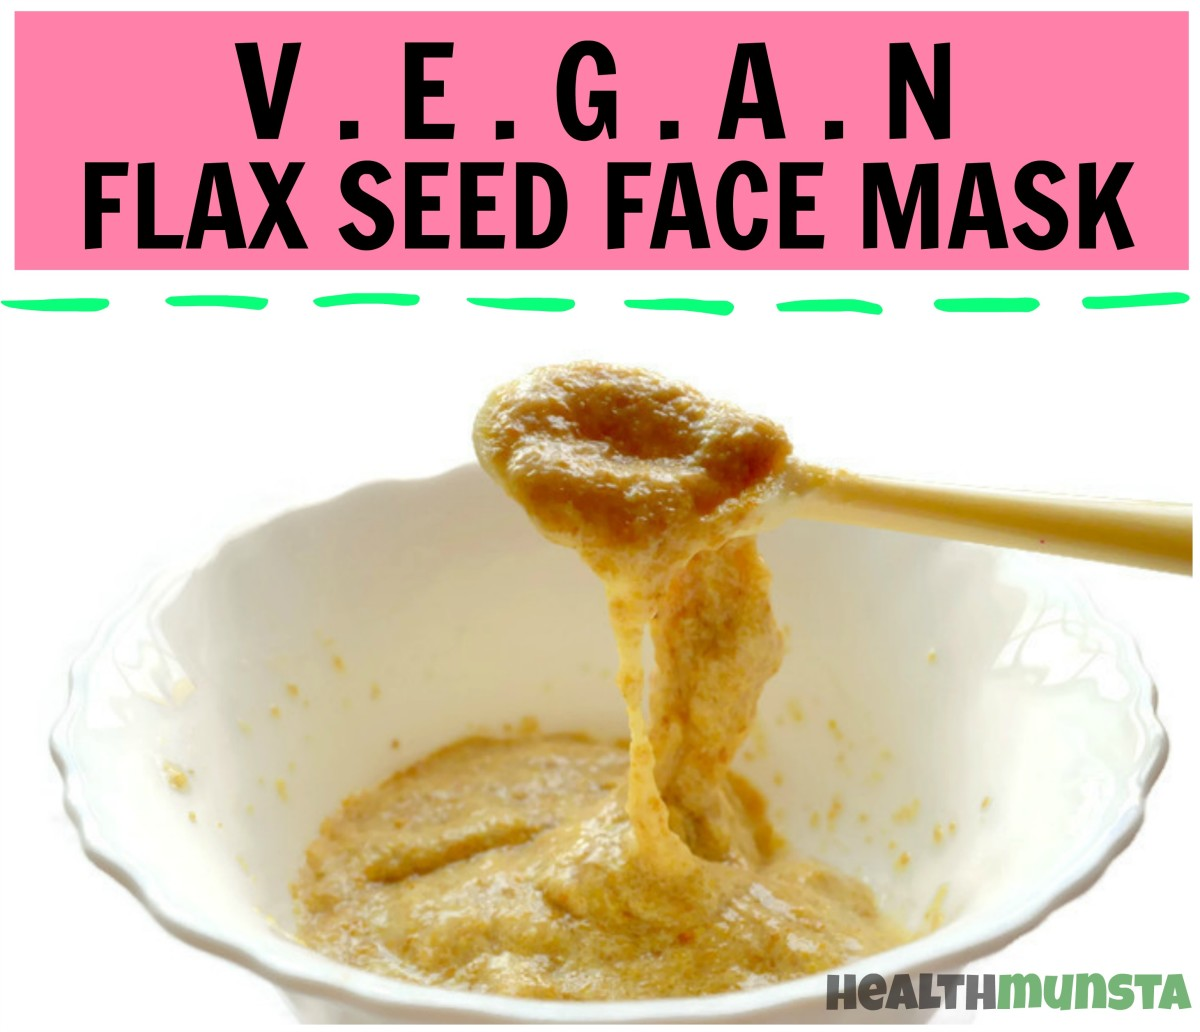 Flaxseed Face Mask for Beautiful Skin | Vegan Face Mask Secrets